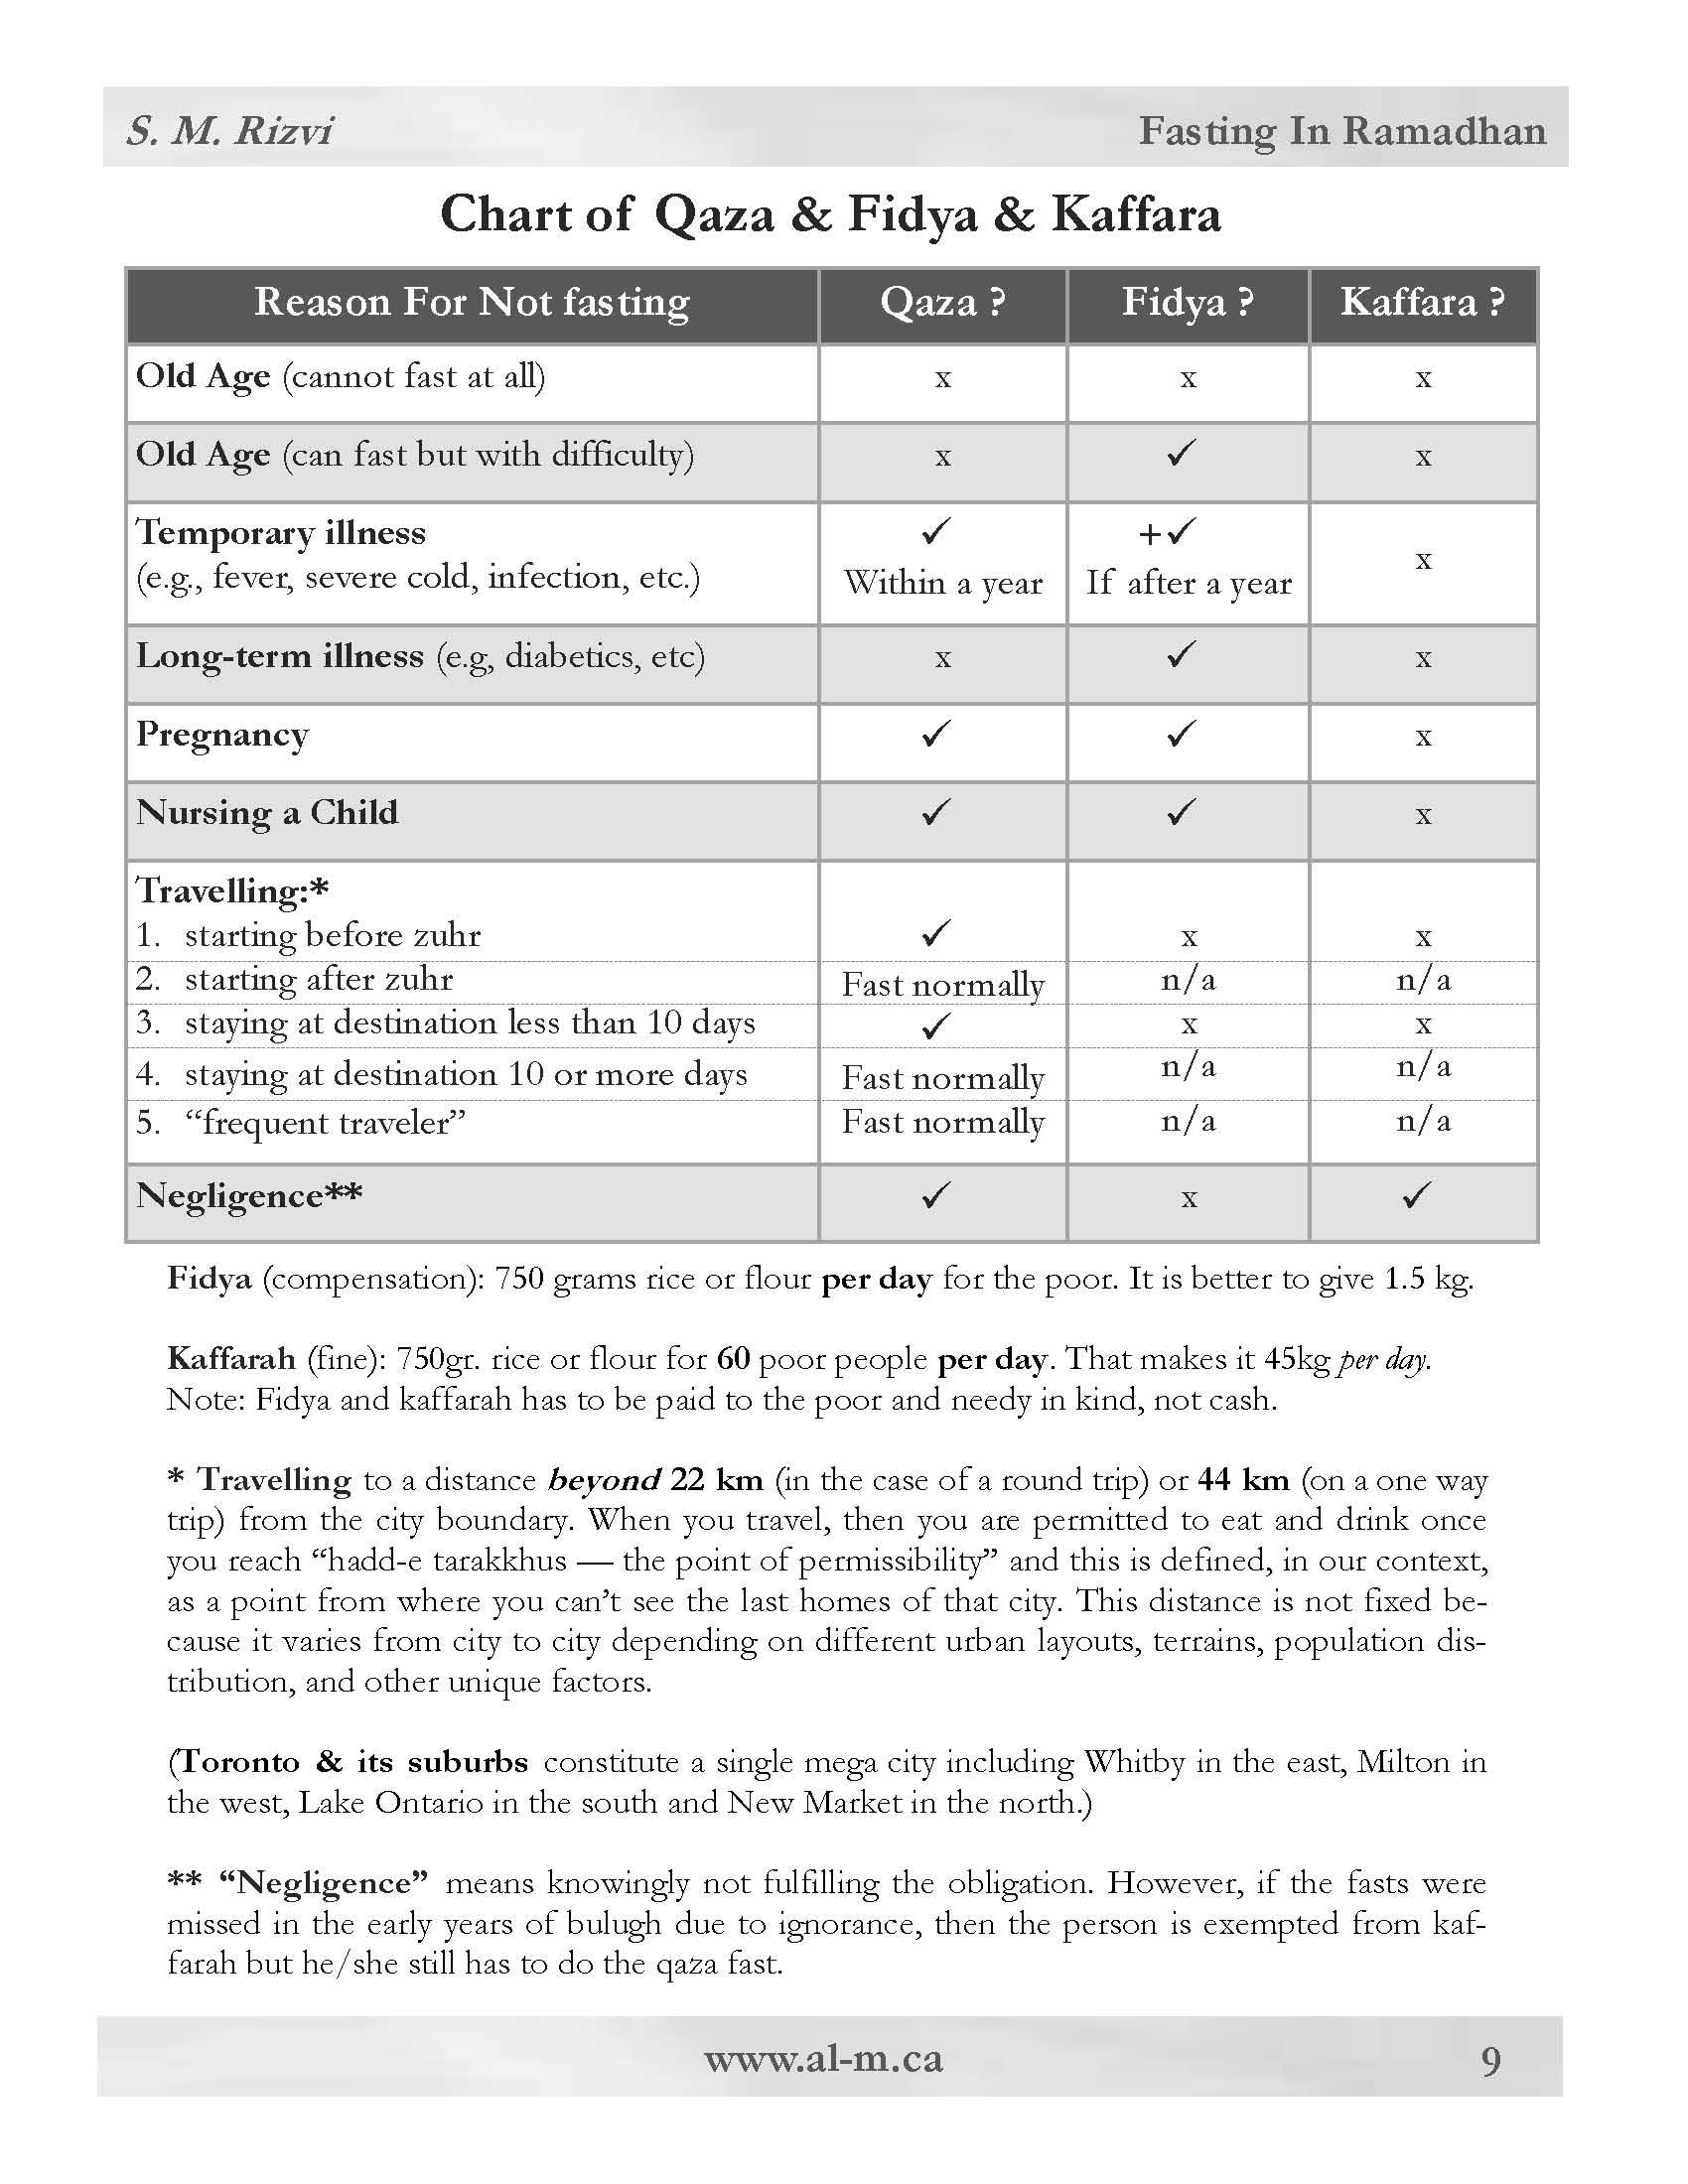 FASTING - ISLAMIC - LAWS